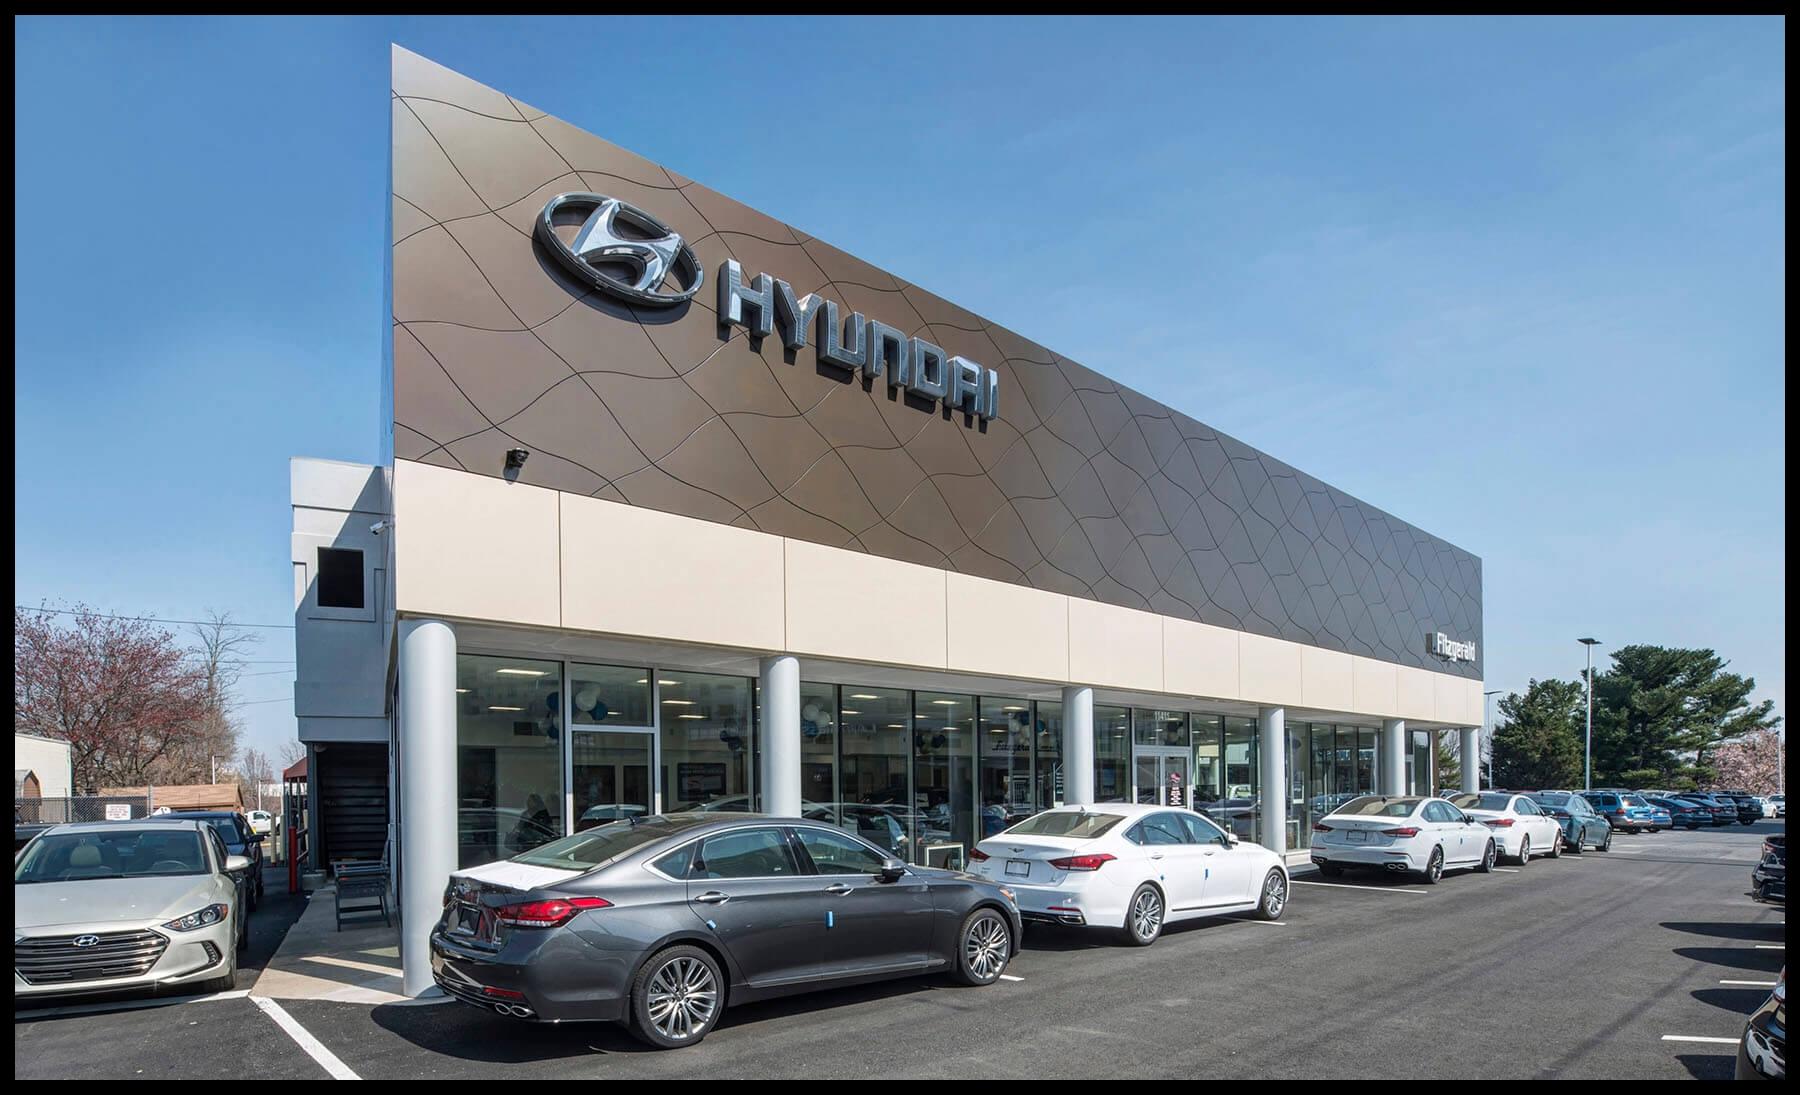 Fitzgerald Hyundai Rockville